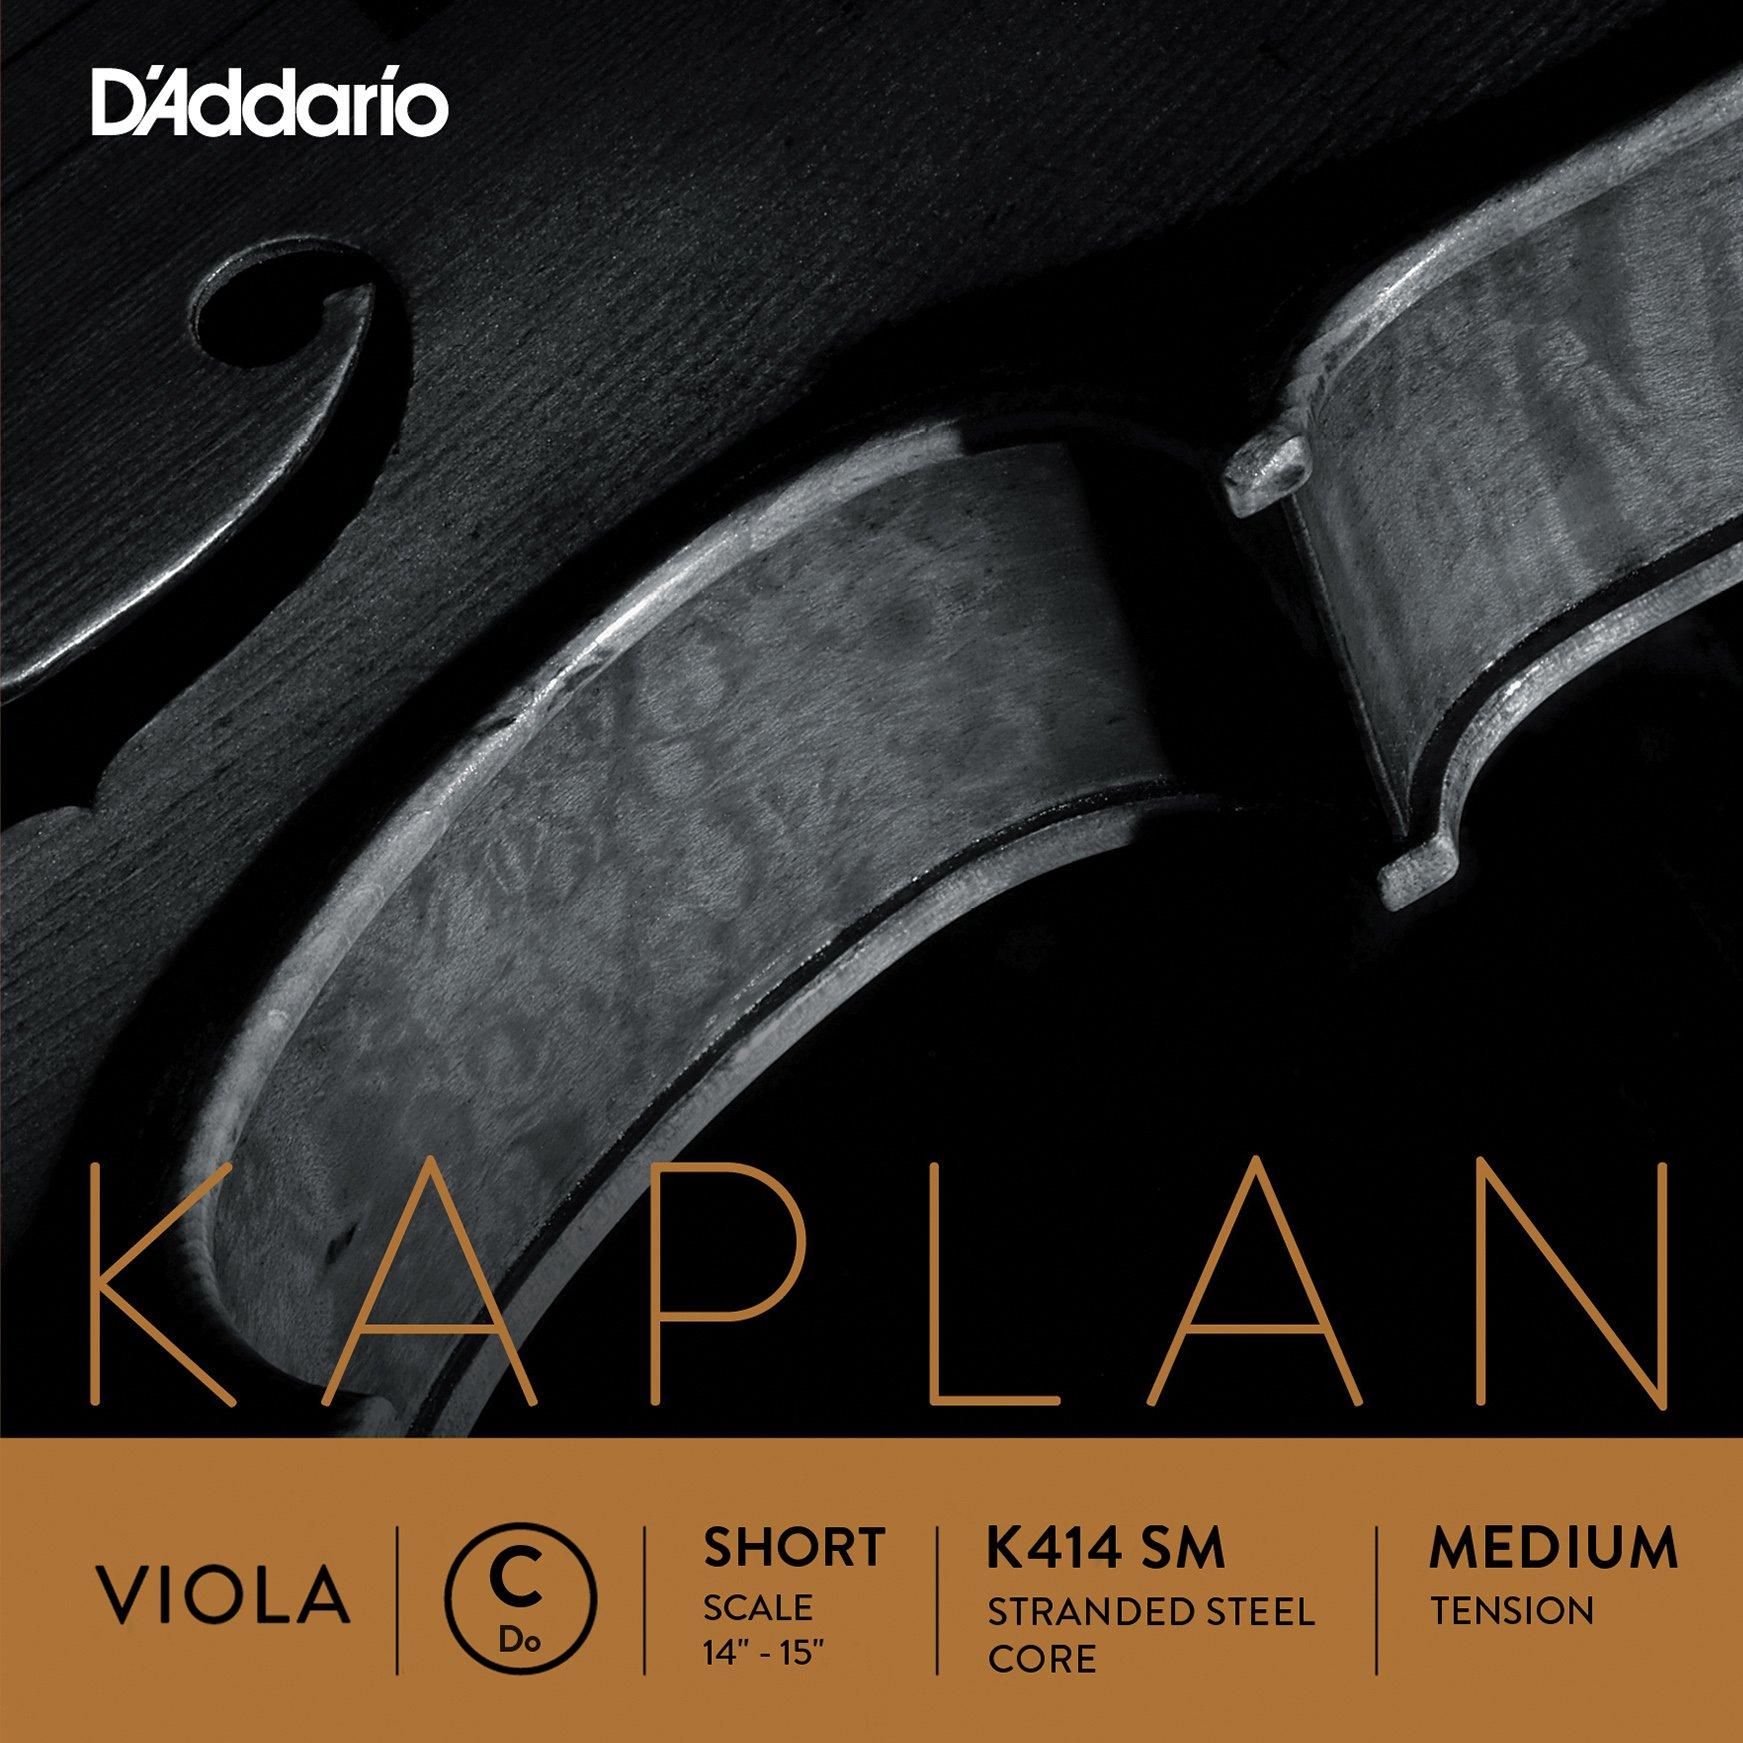 D'Addario Kaplan Viola Single C String, Short Scale, Medium Tension